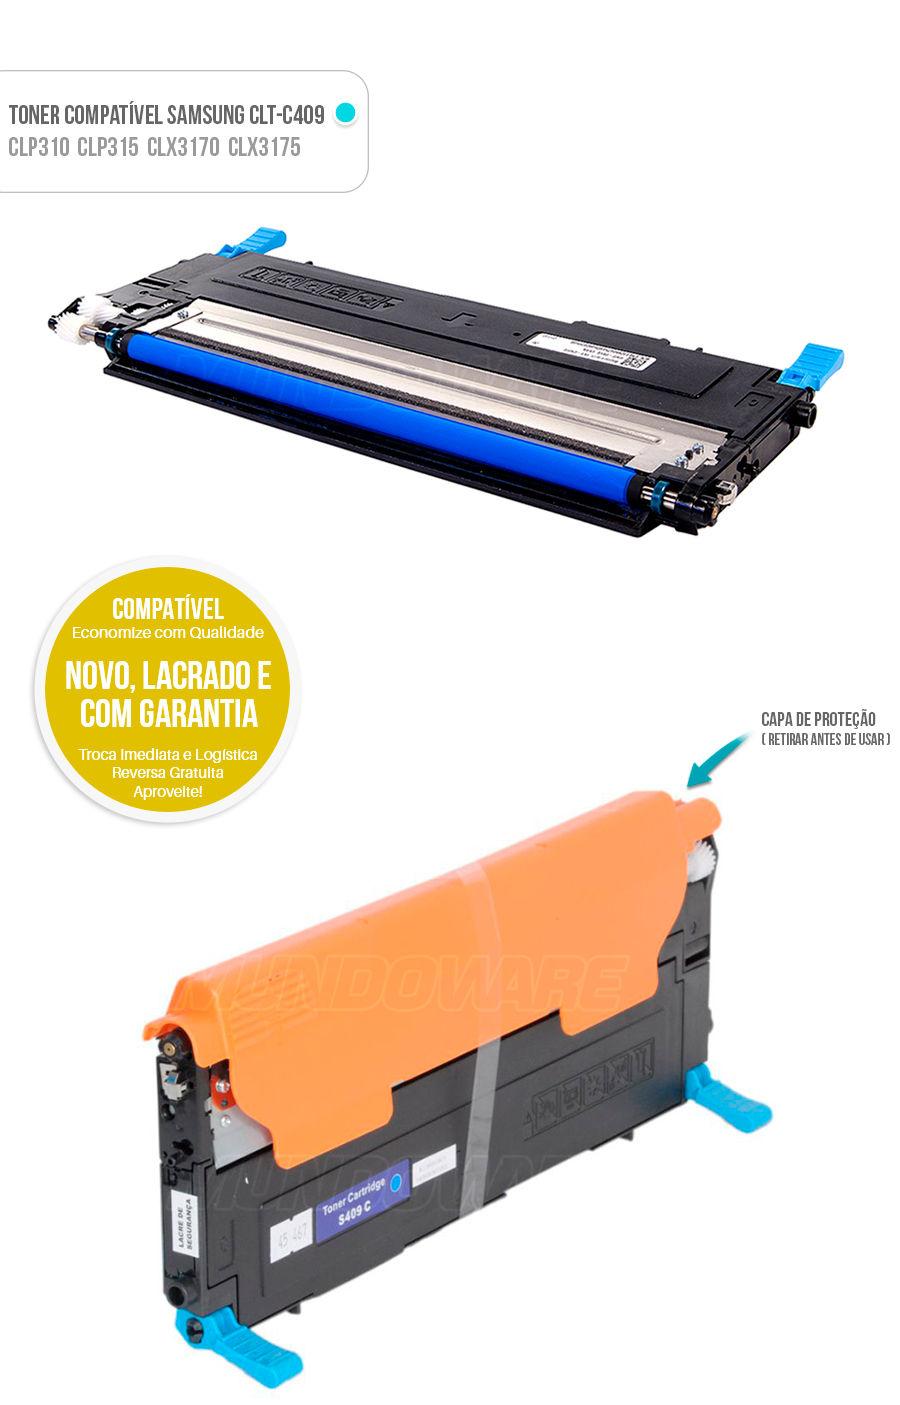 Toner compativel para impressora Samsung CLT-C409S C409S CLTC409S CLTC409 C409 Ciano Azul